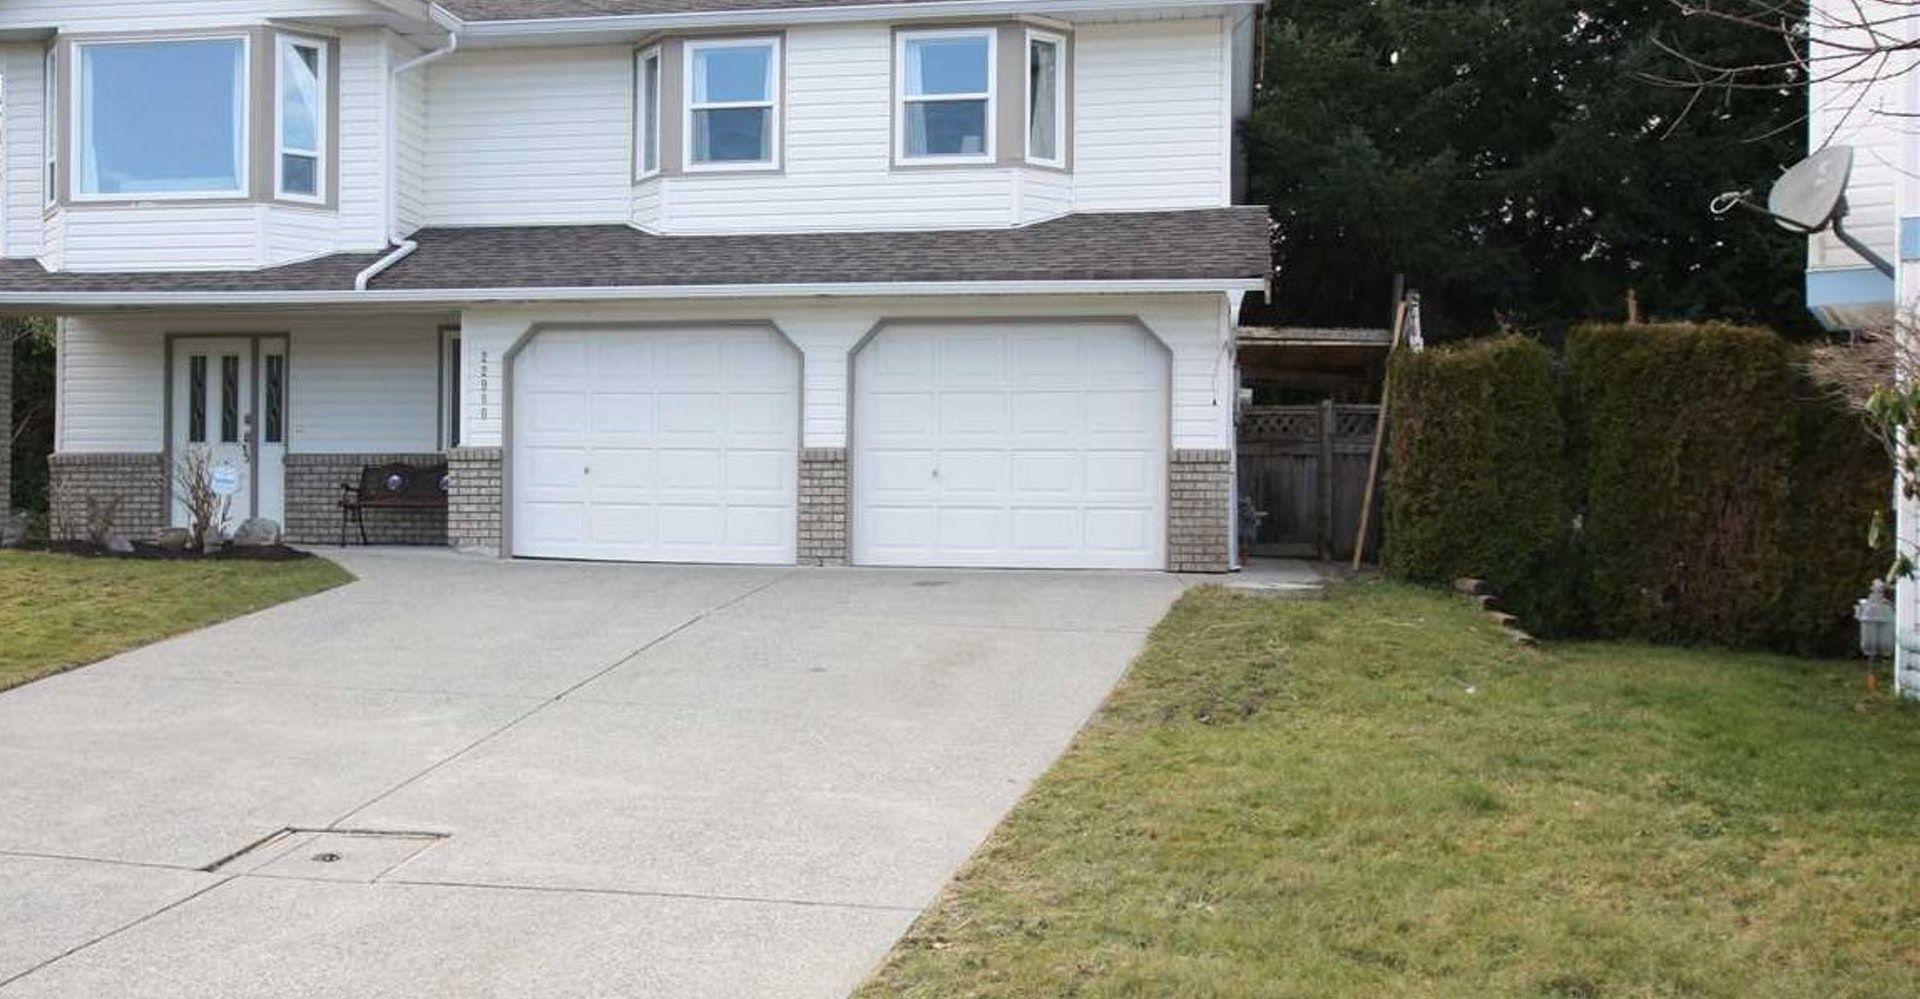 Main Photo: 22980 124B Street in Maple RIdge: East Central House for sale (Maple Ridge)  : MLS®# R2335857